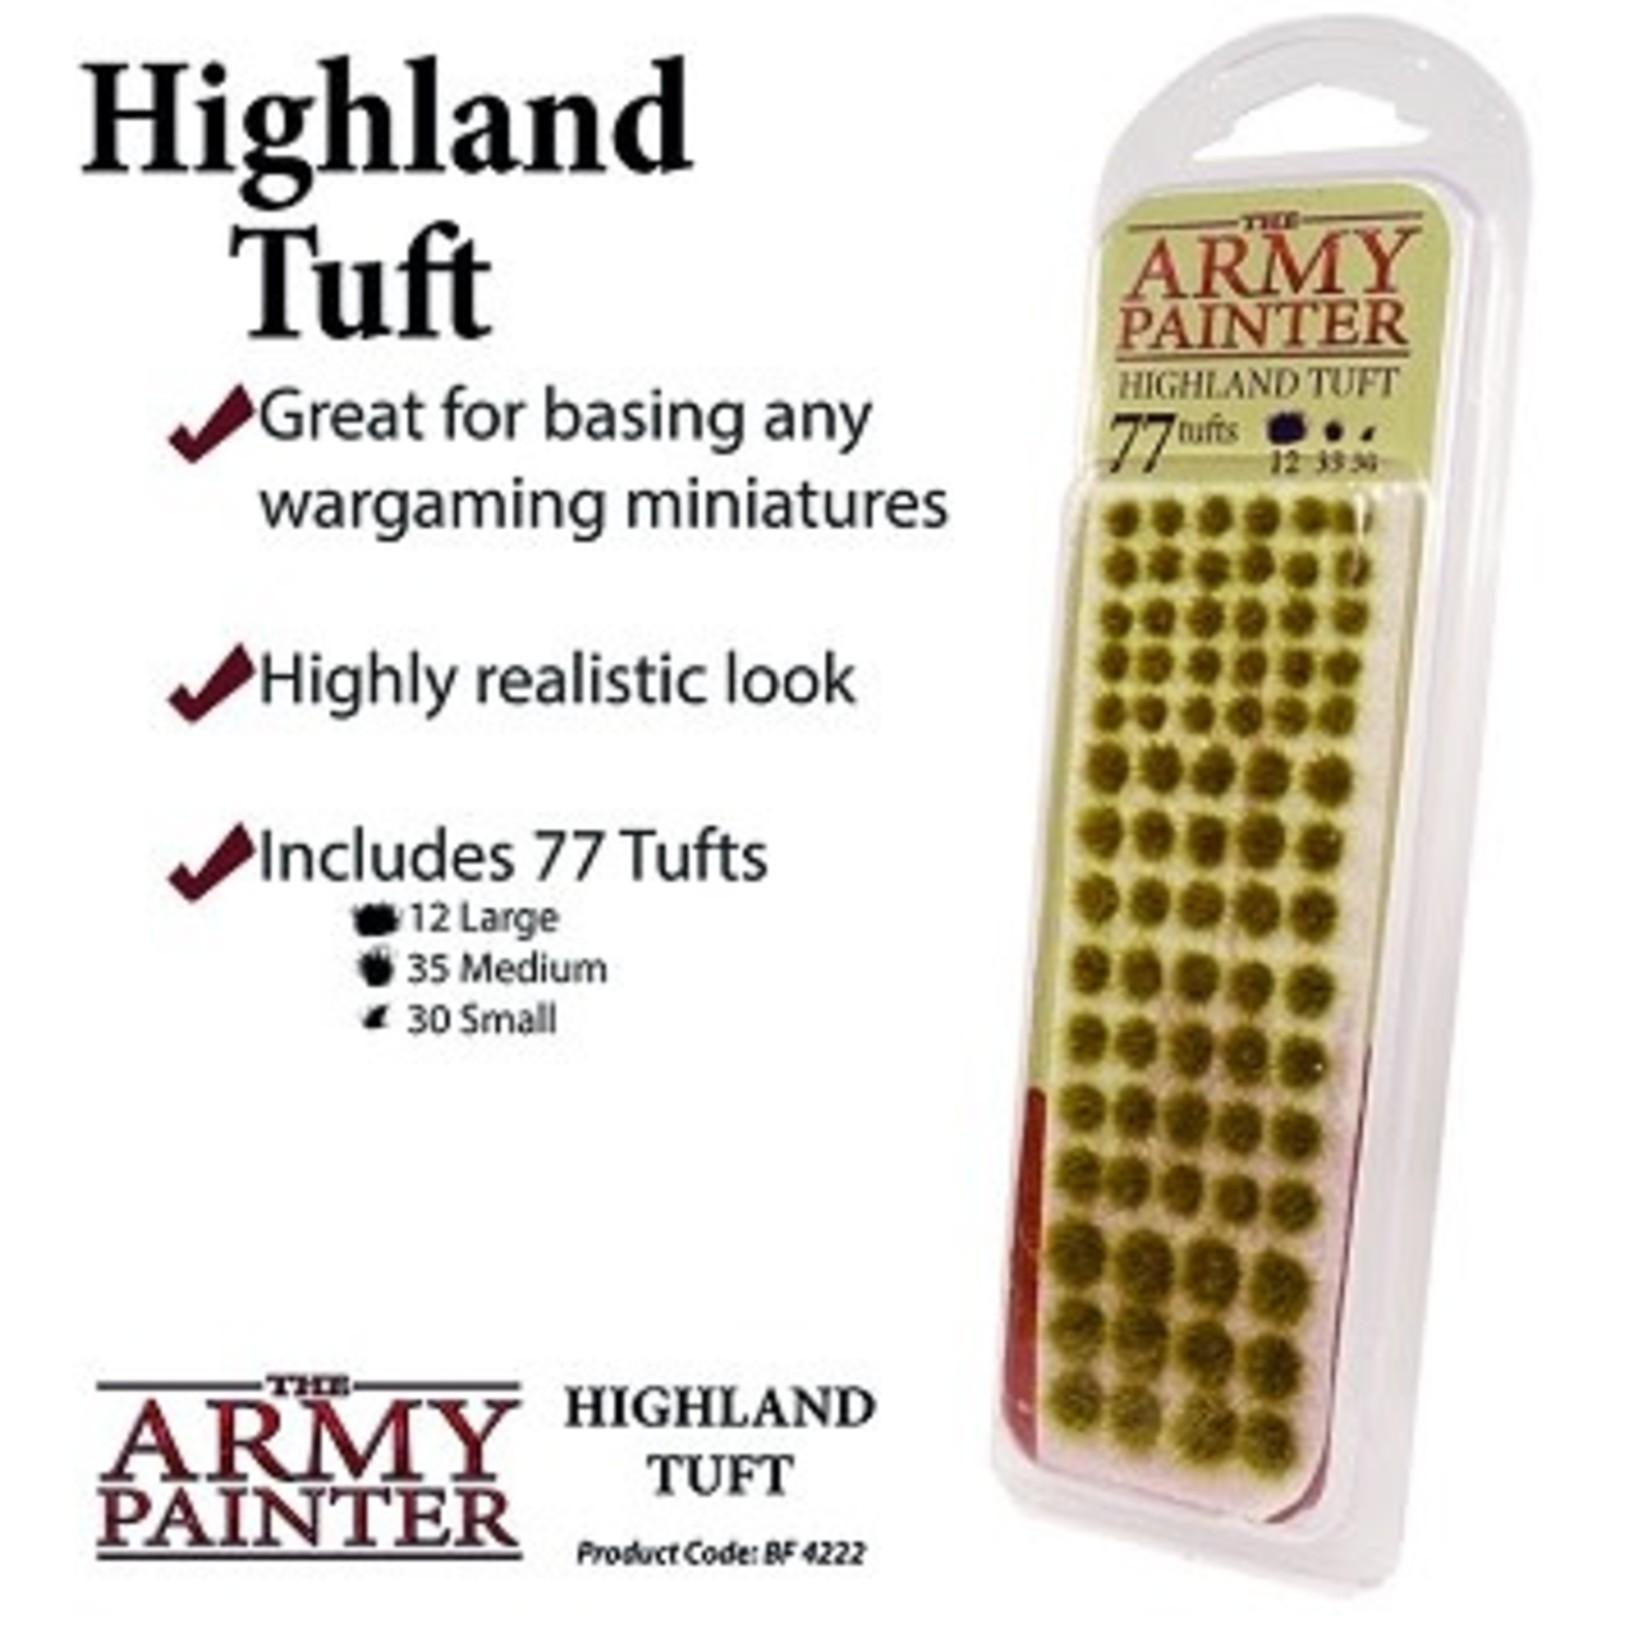 Army Painter Battlefields XP: Highland Tufts